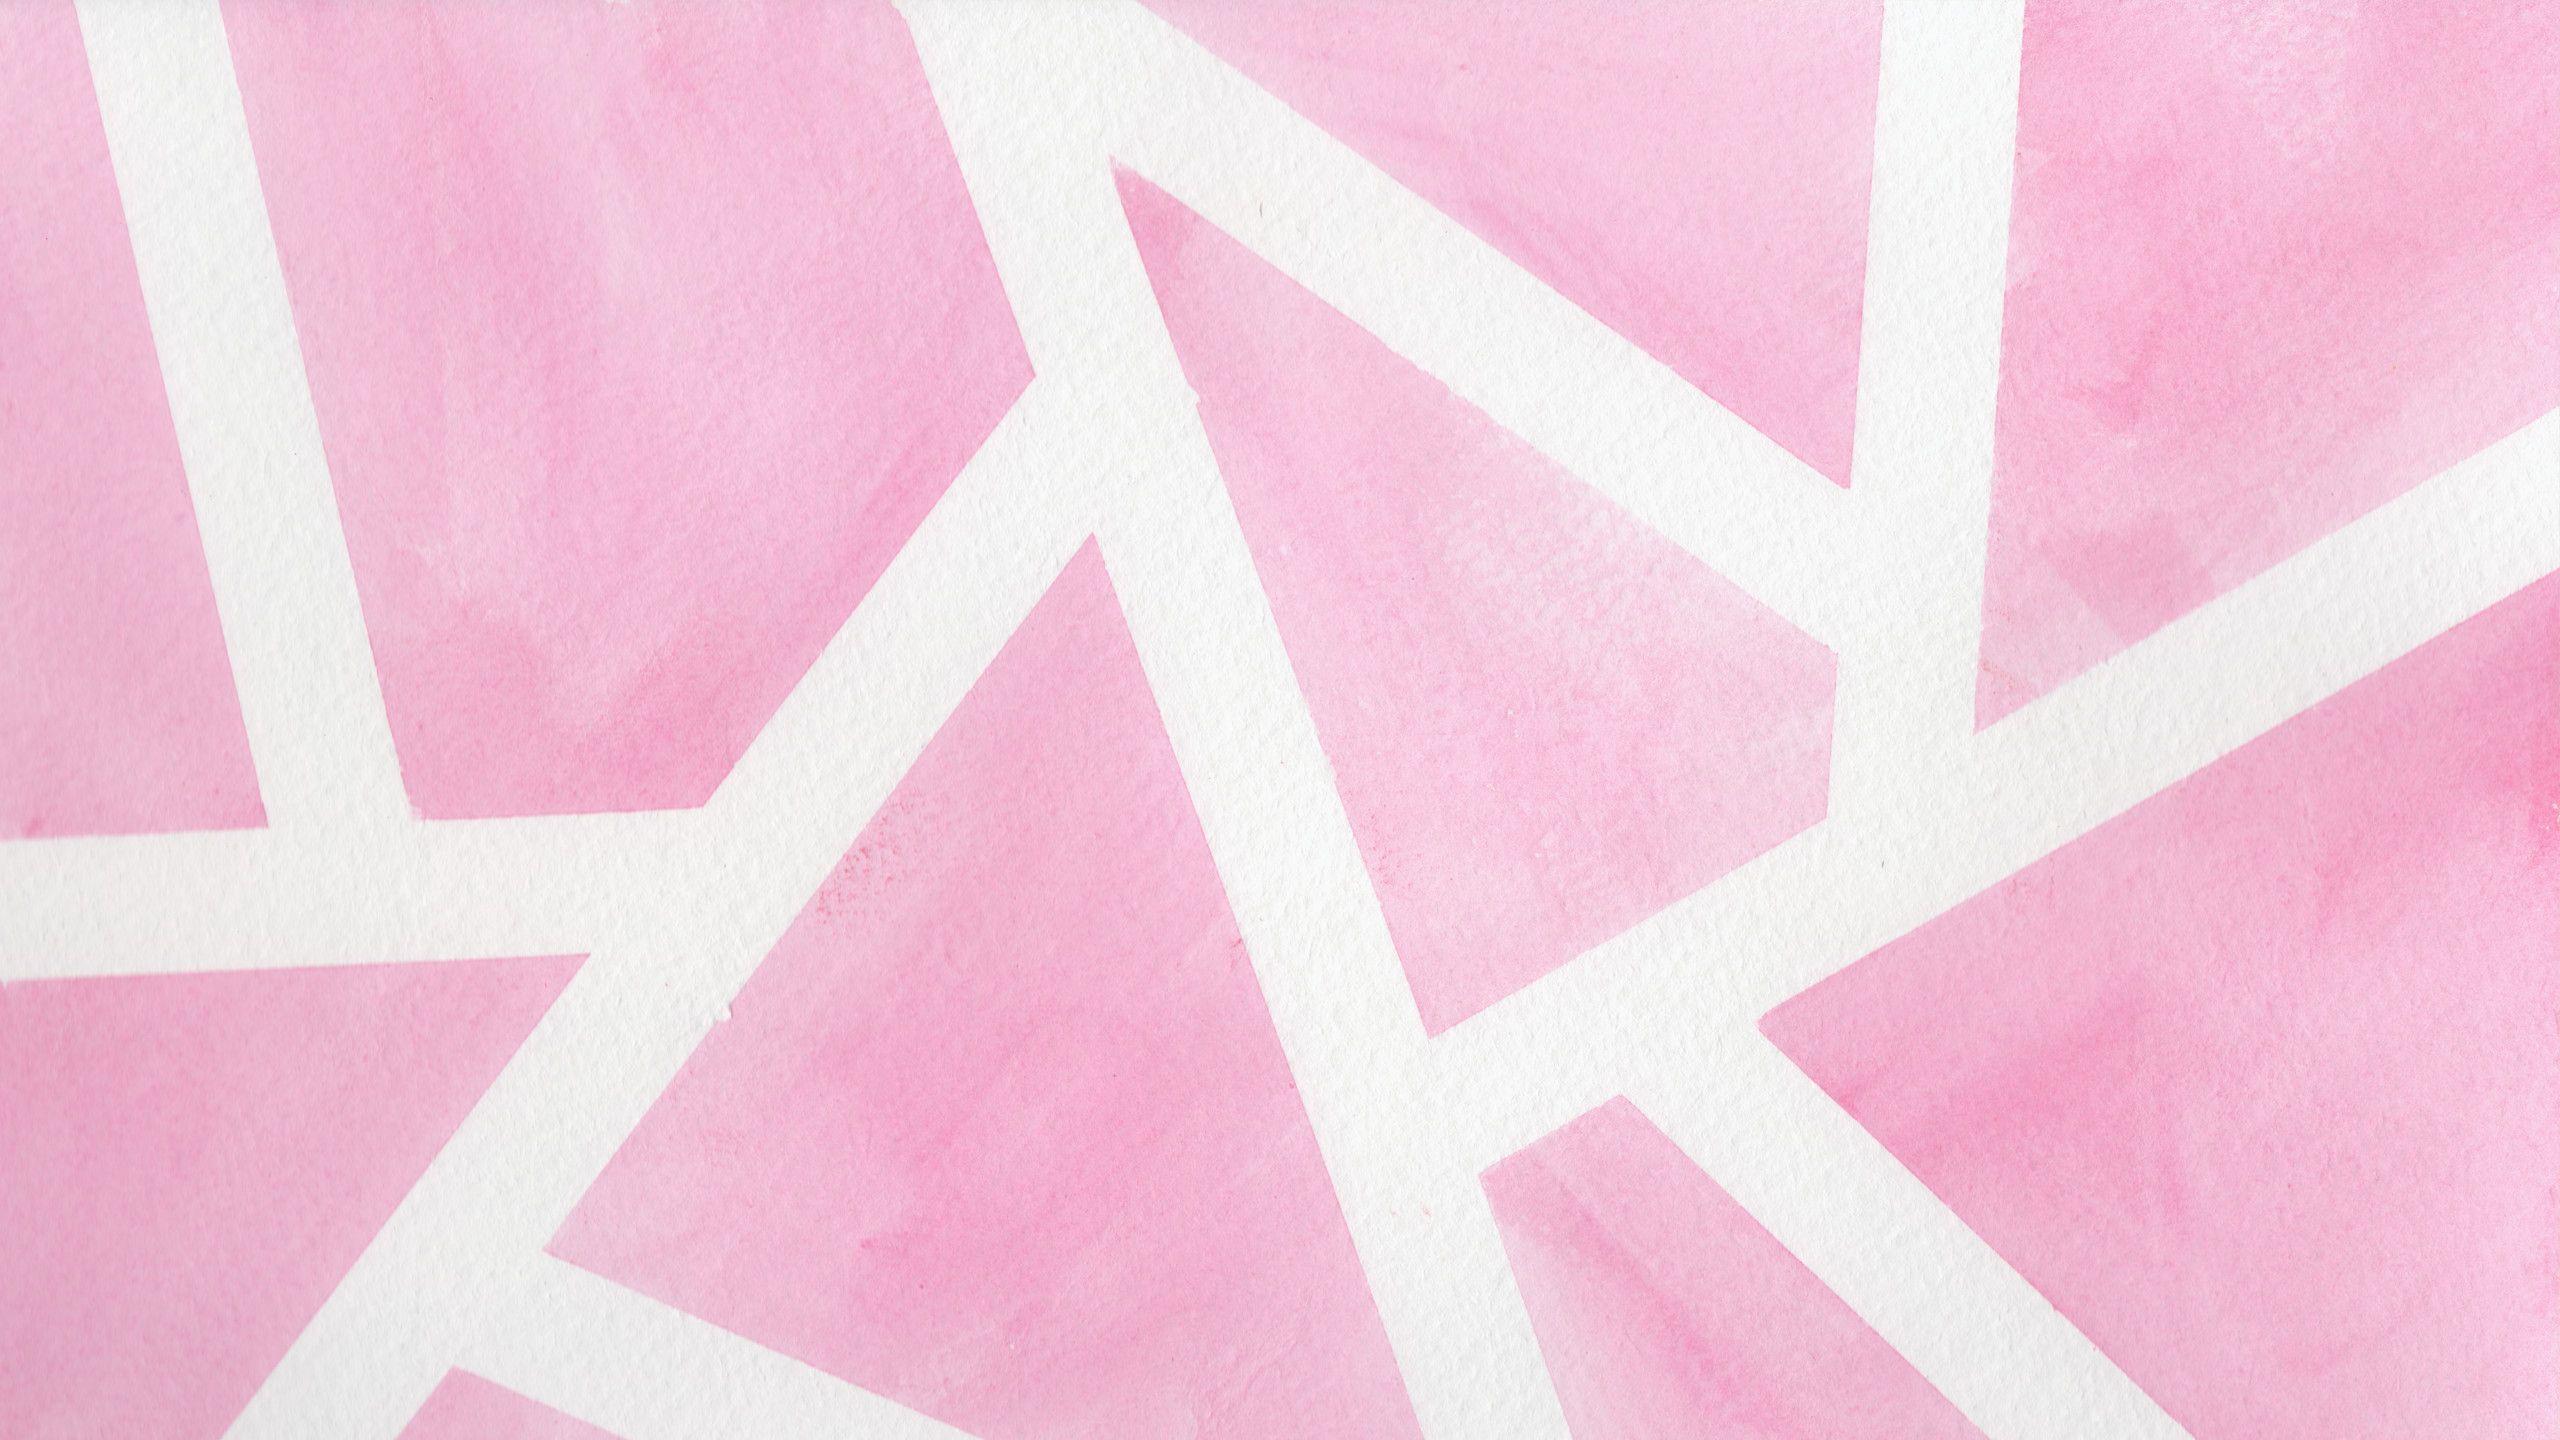 Pink Laptop Background 2560x1440 Wallpaper Teahub Io